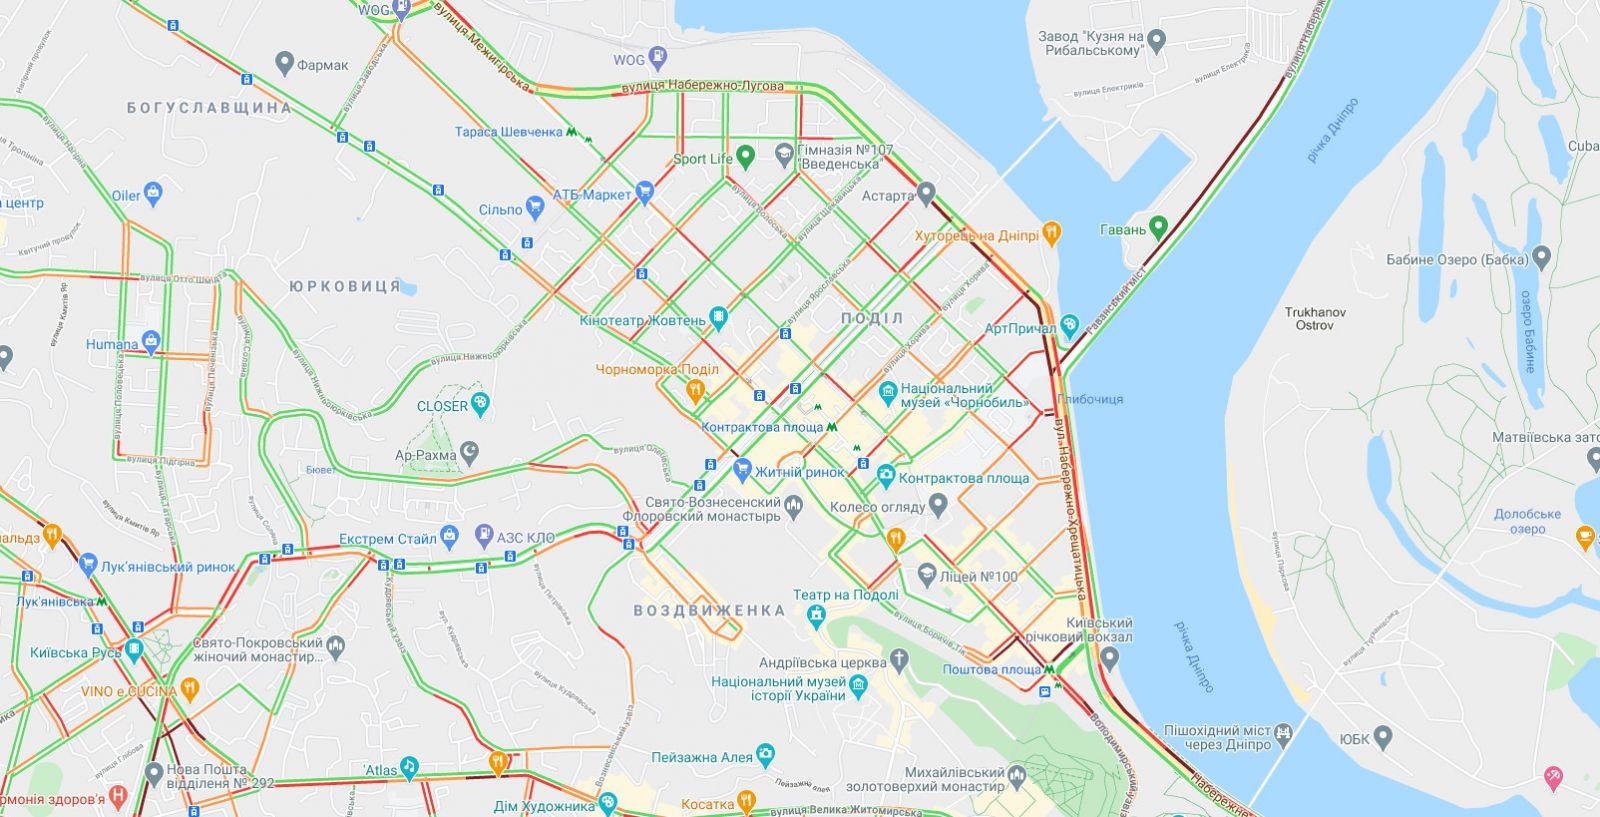 Пробки в Киеве, карта: Google Maps